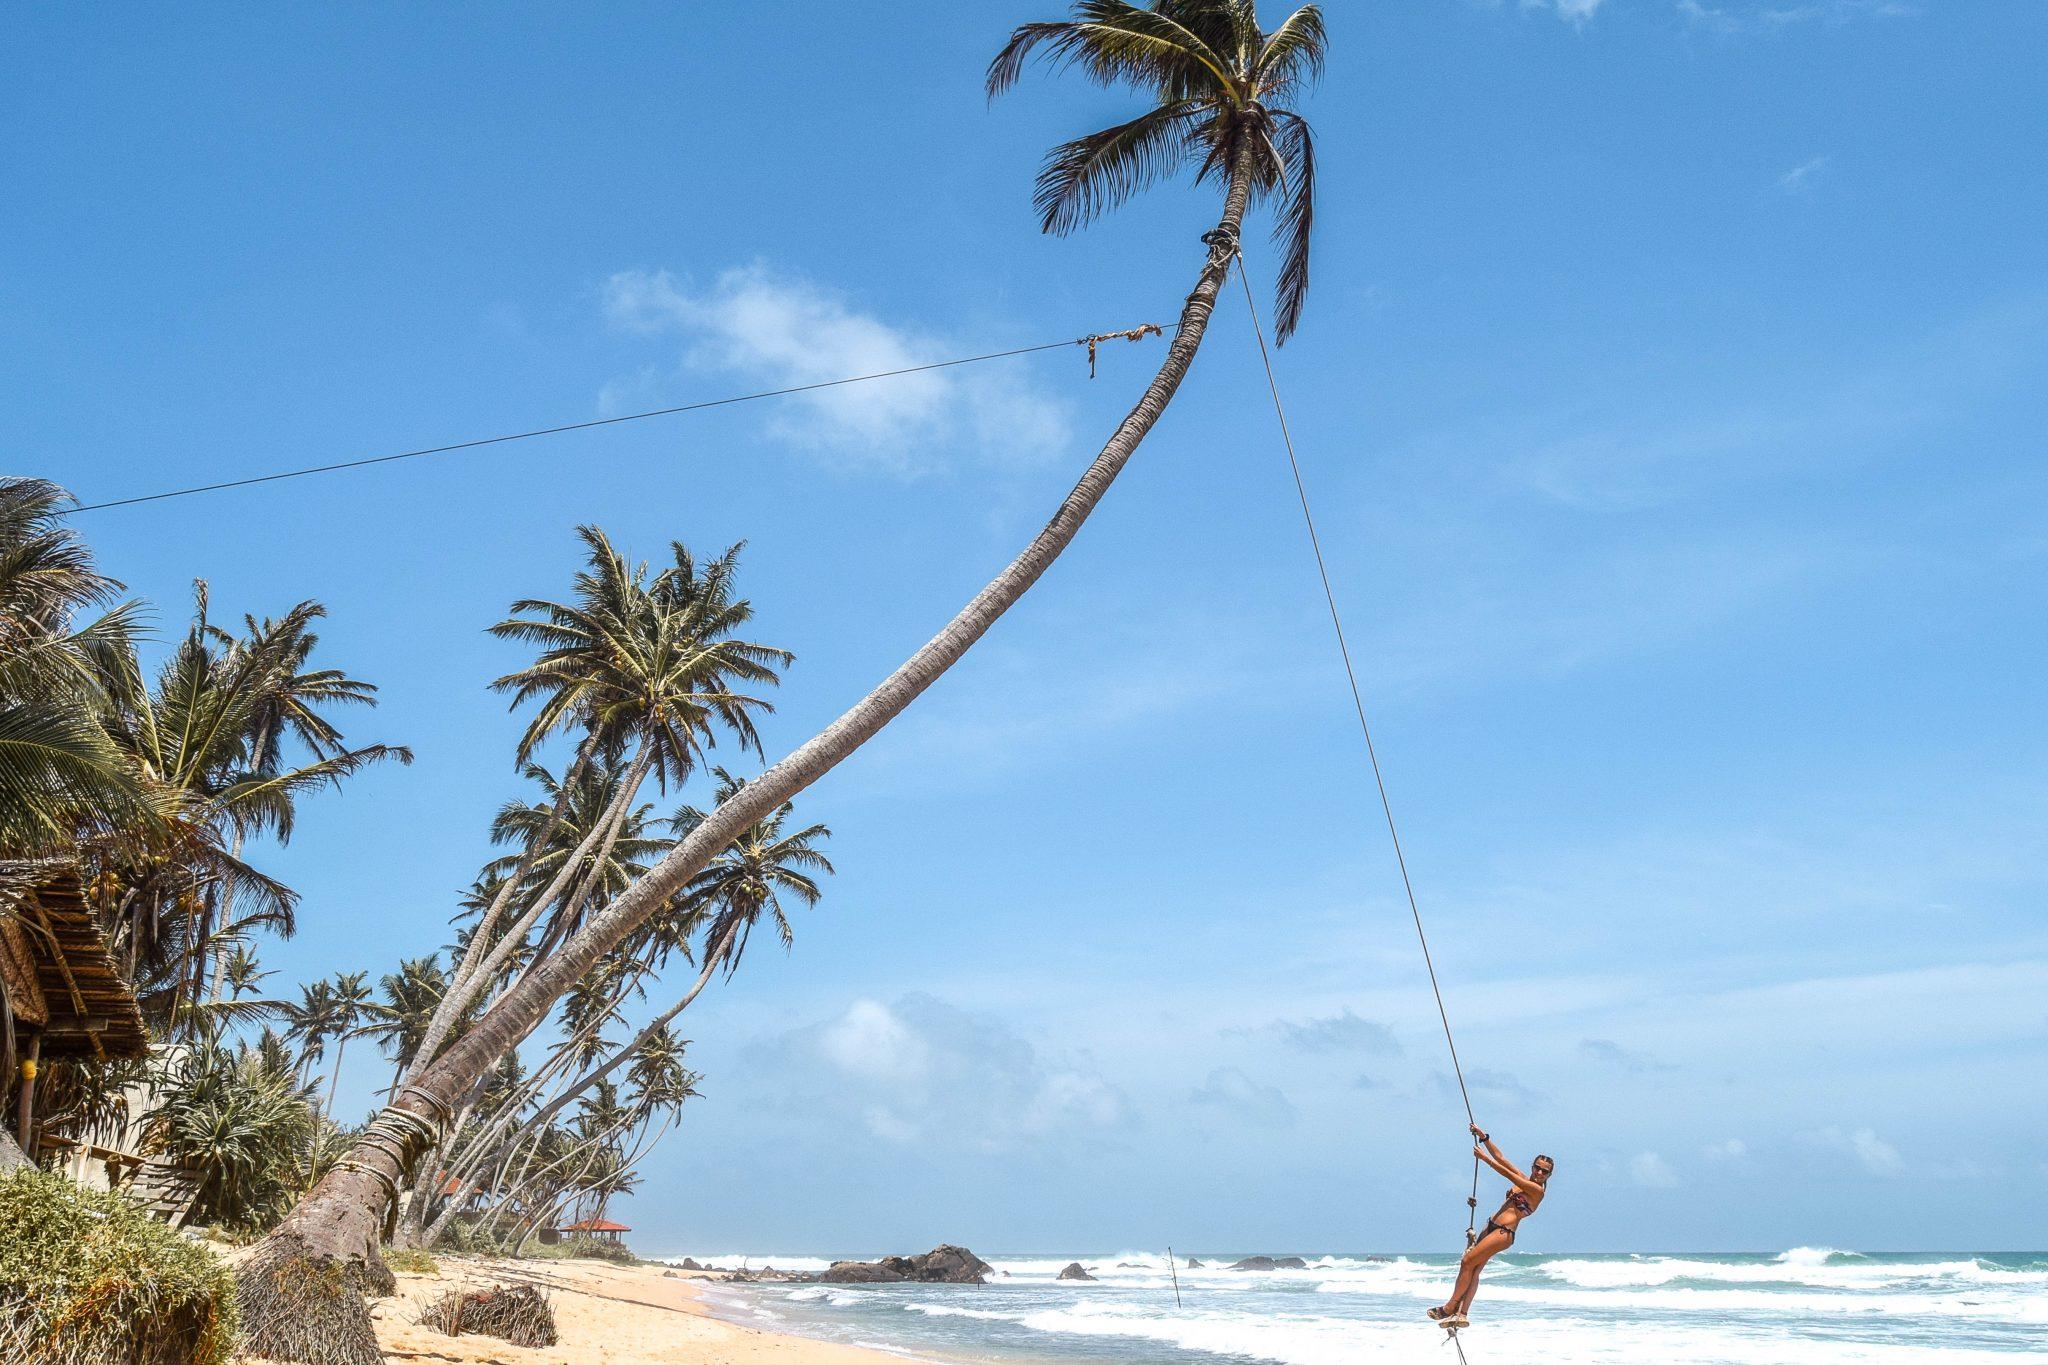 Wanderers & Warriors - Charlie & Lauren UK Travel Couple - Things To Do In Unawatuna - Dalawella Beach Swing